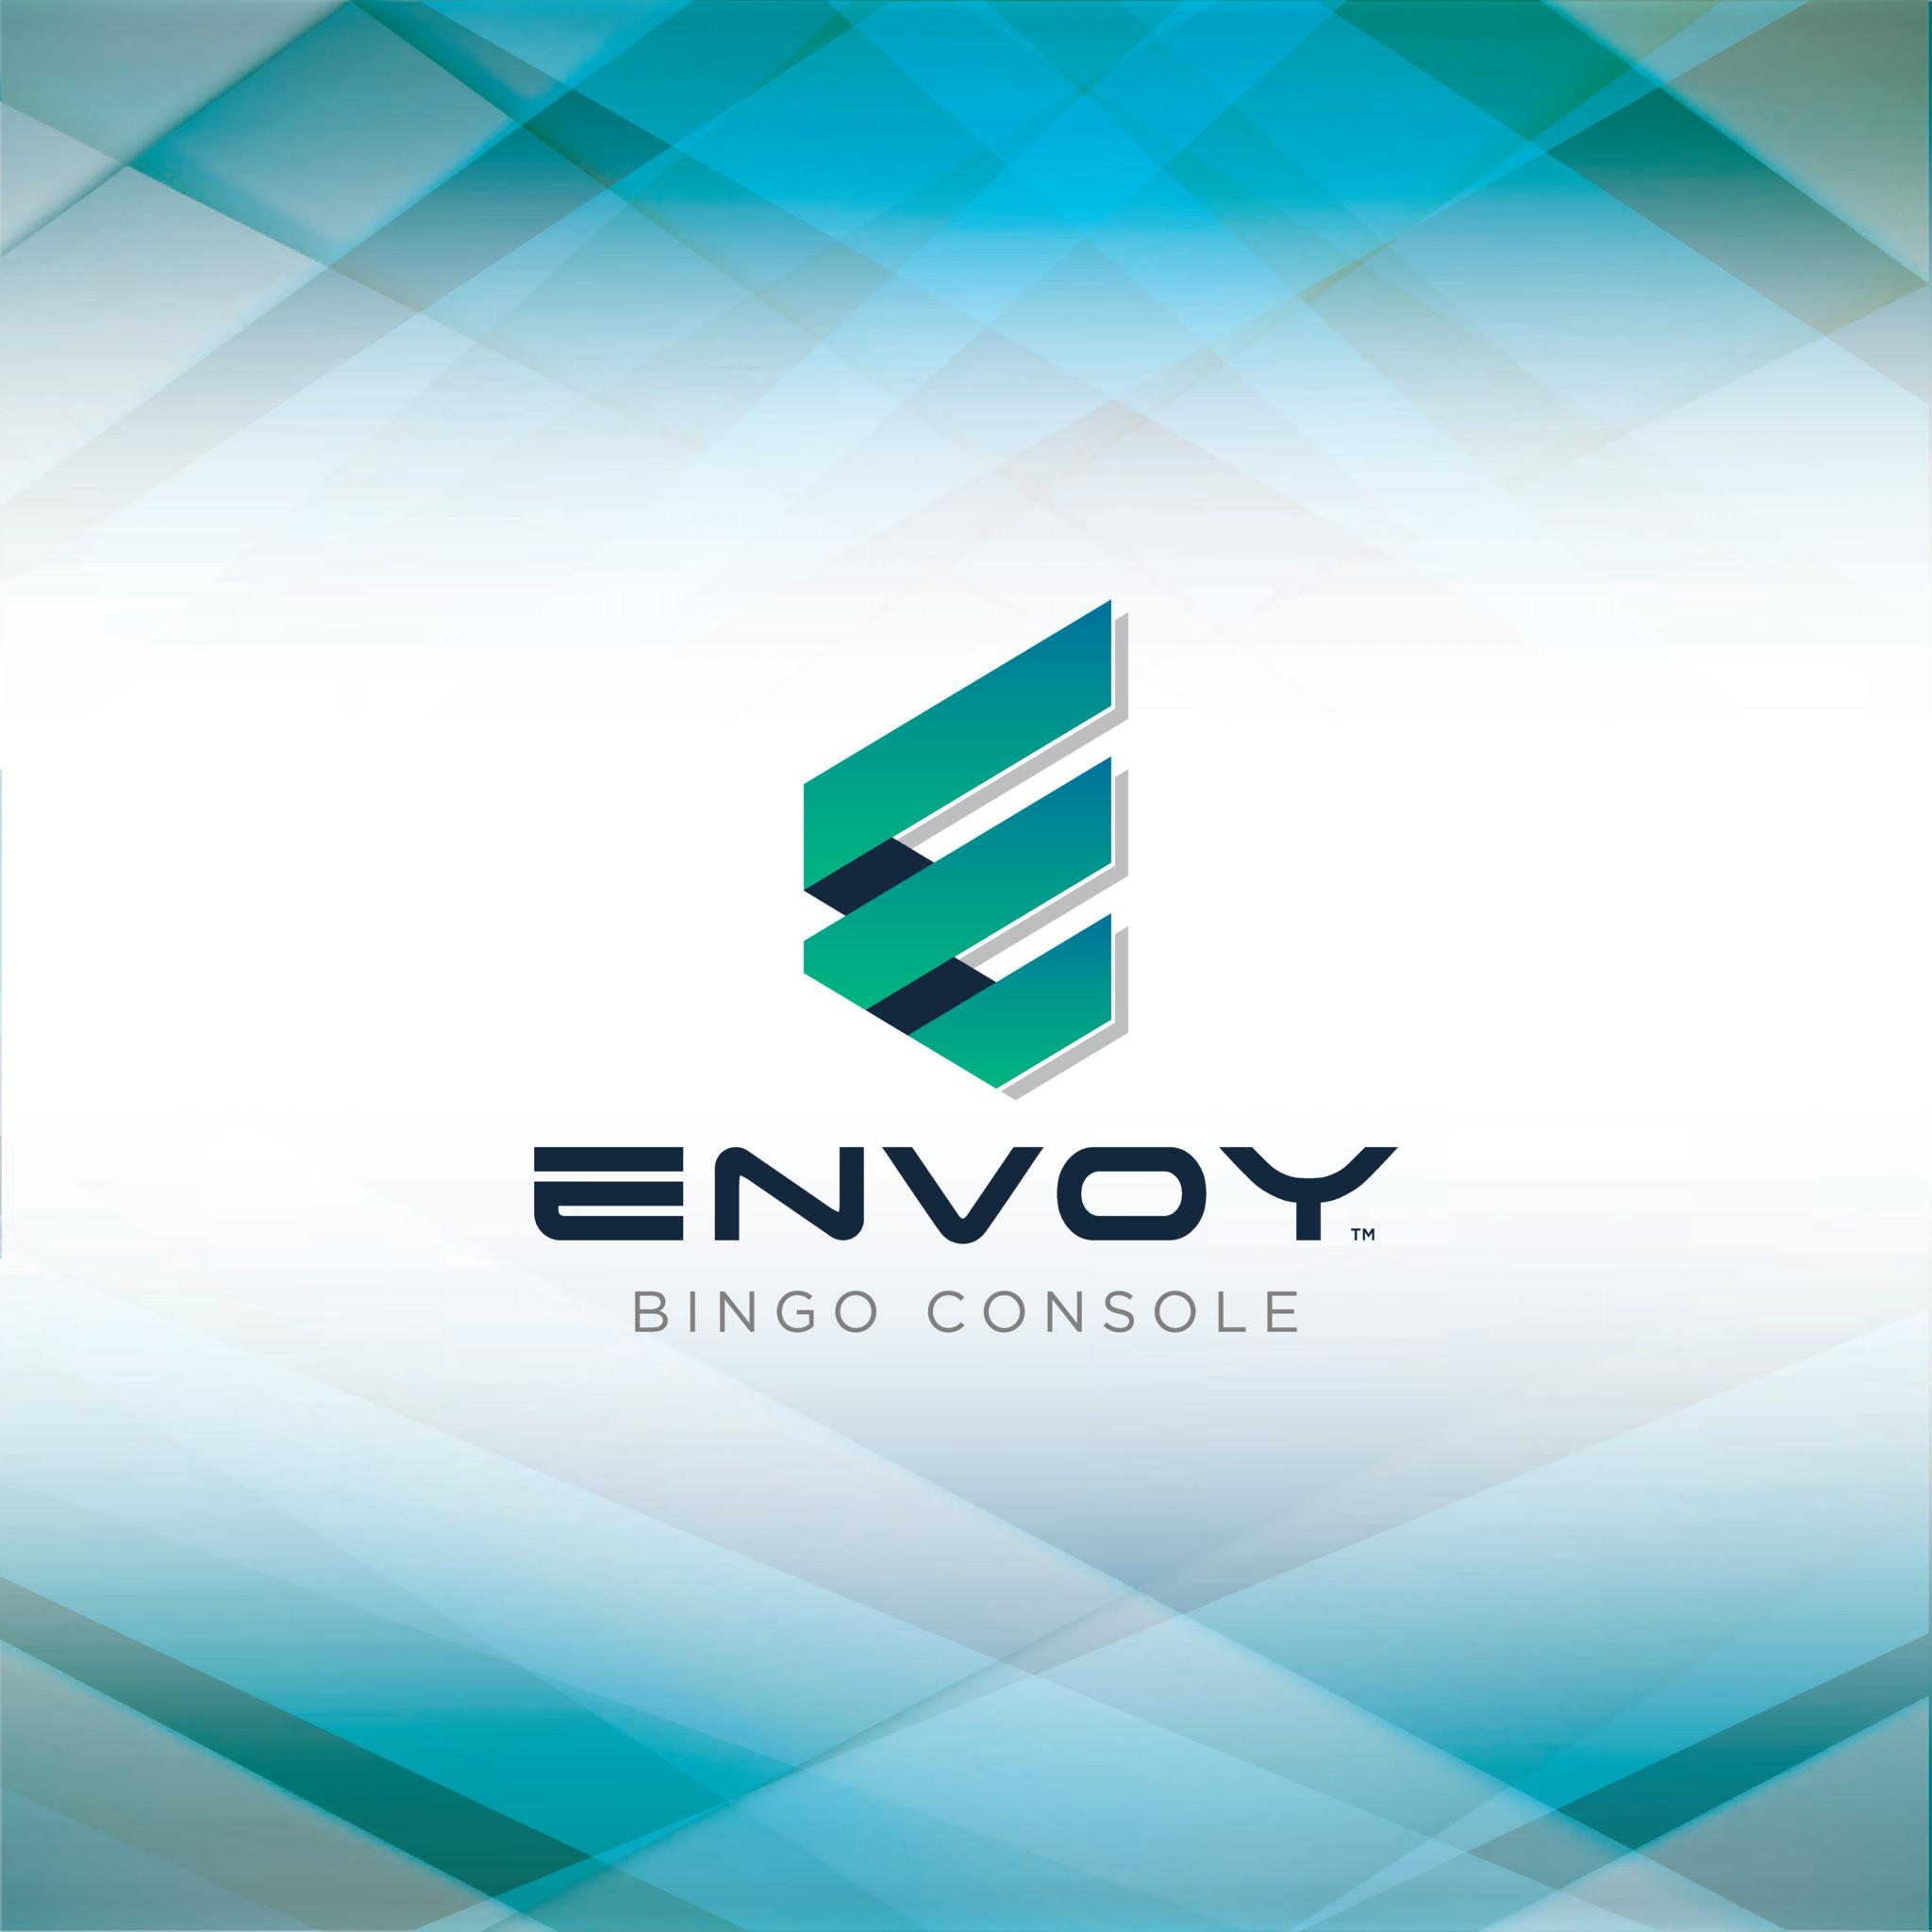 Envoy Bingo Console Brochure Promotional Materials/Equipment Flyers & Brochures